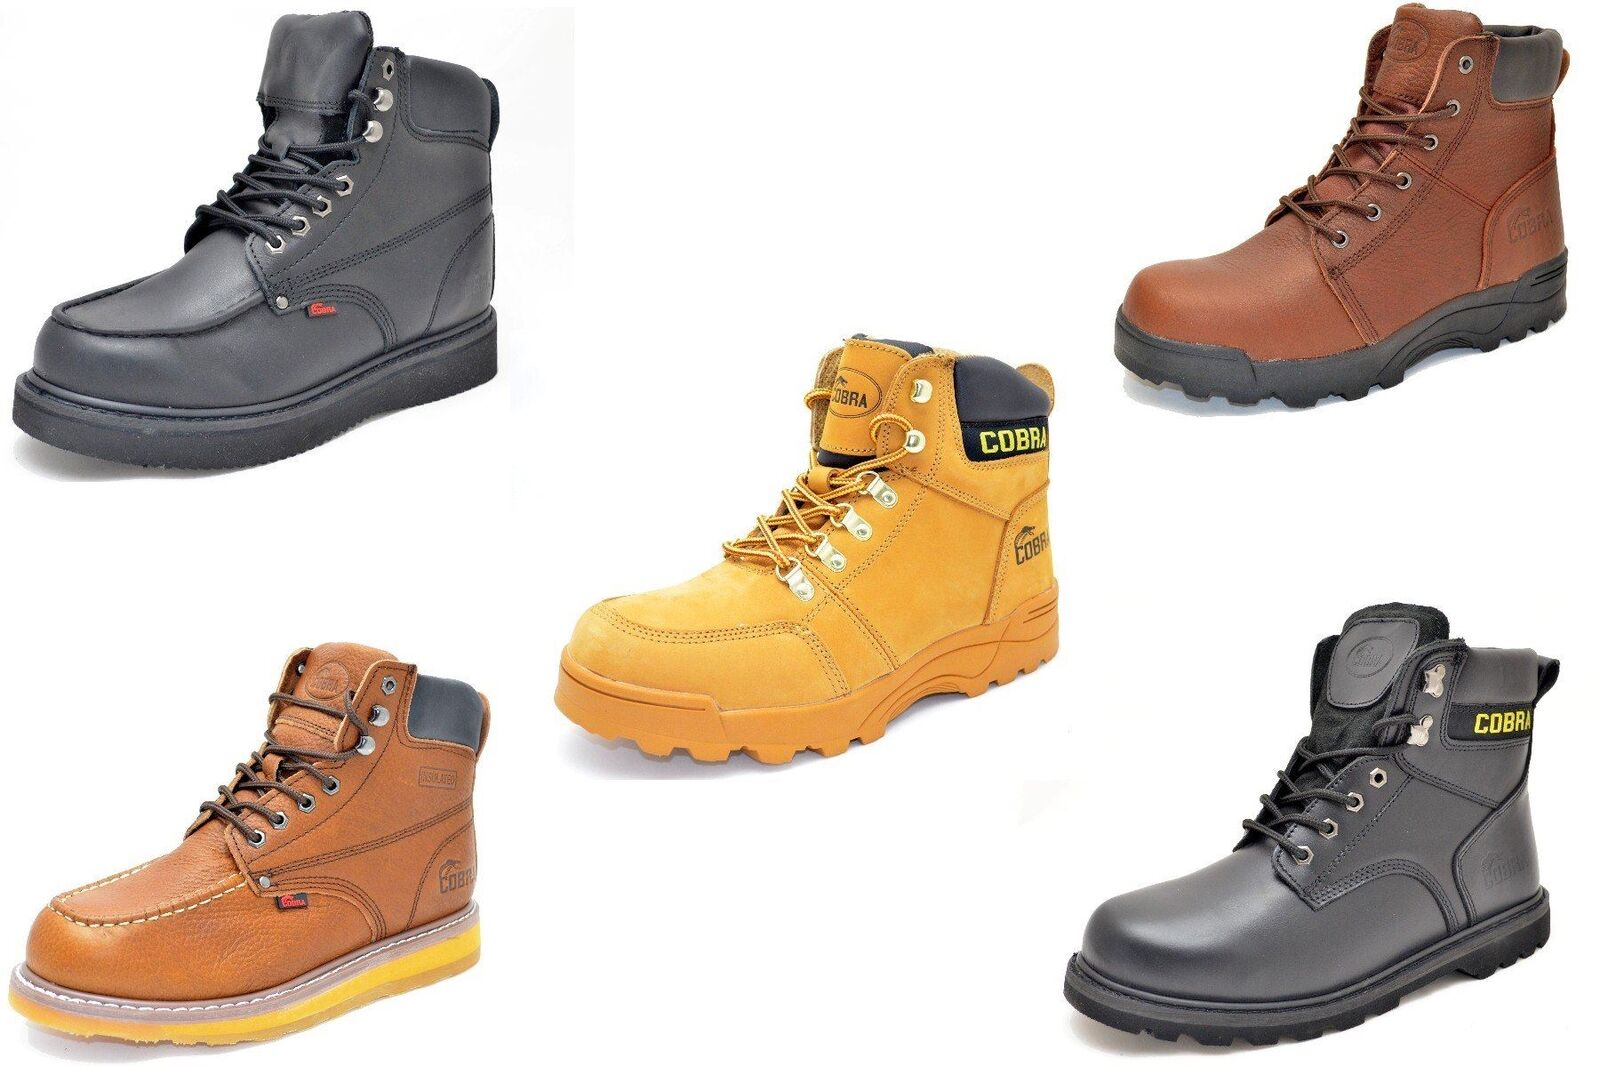 Cobra Cobra Cobra Work stivali nero, Marrone, Tan Genuine Leather (Avail. in Steel Toe) 7b6202